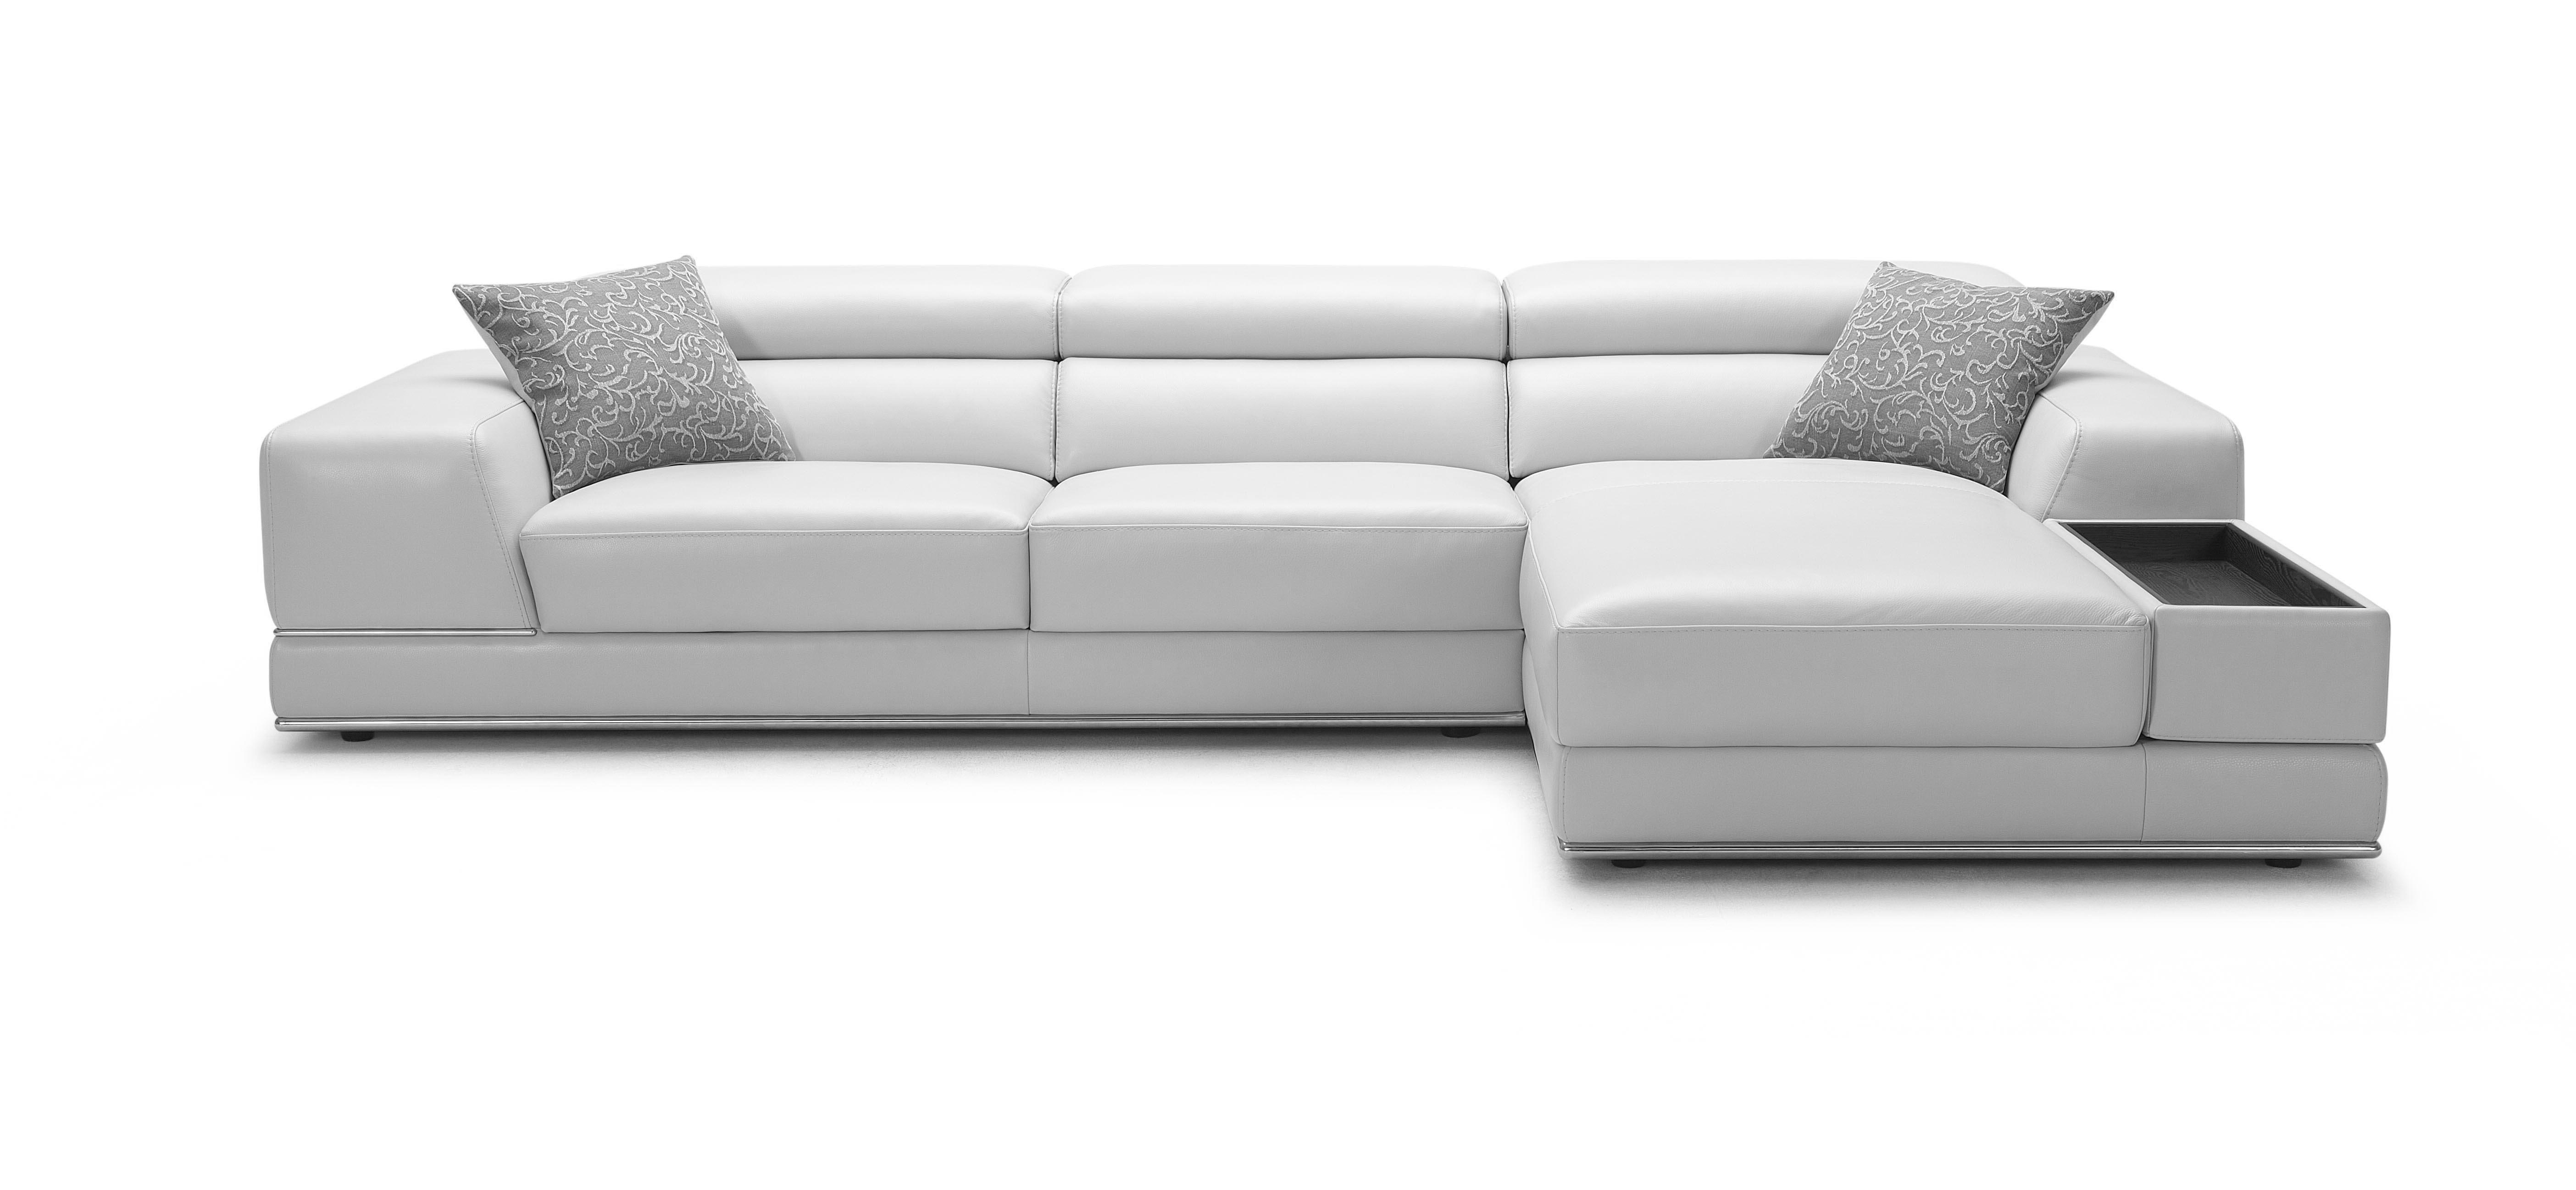 Bergamo White Sectional Leather Sofa